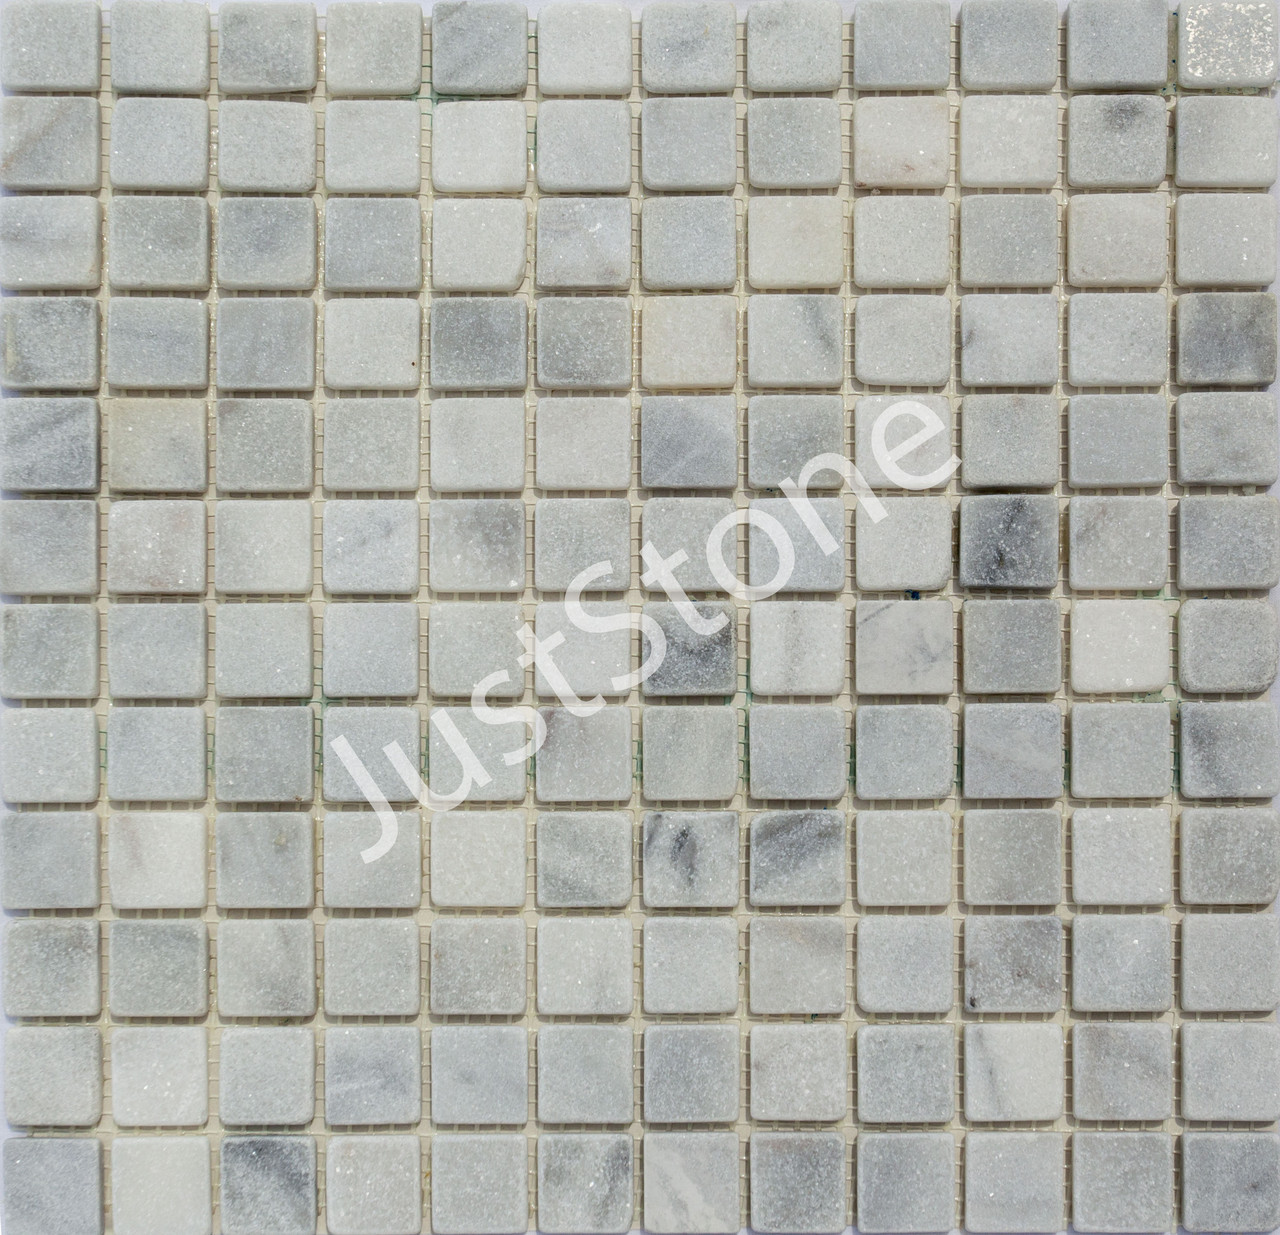 Мраморная Мозаичная плитка Стар.Валт. МКР-2СВ (23х23) 6 мм White Mix